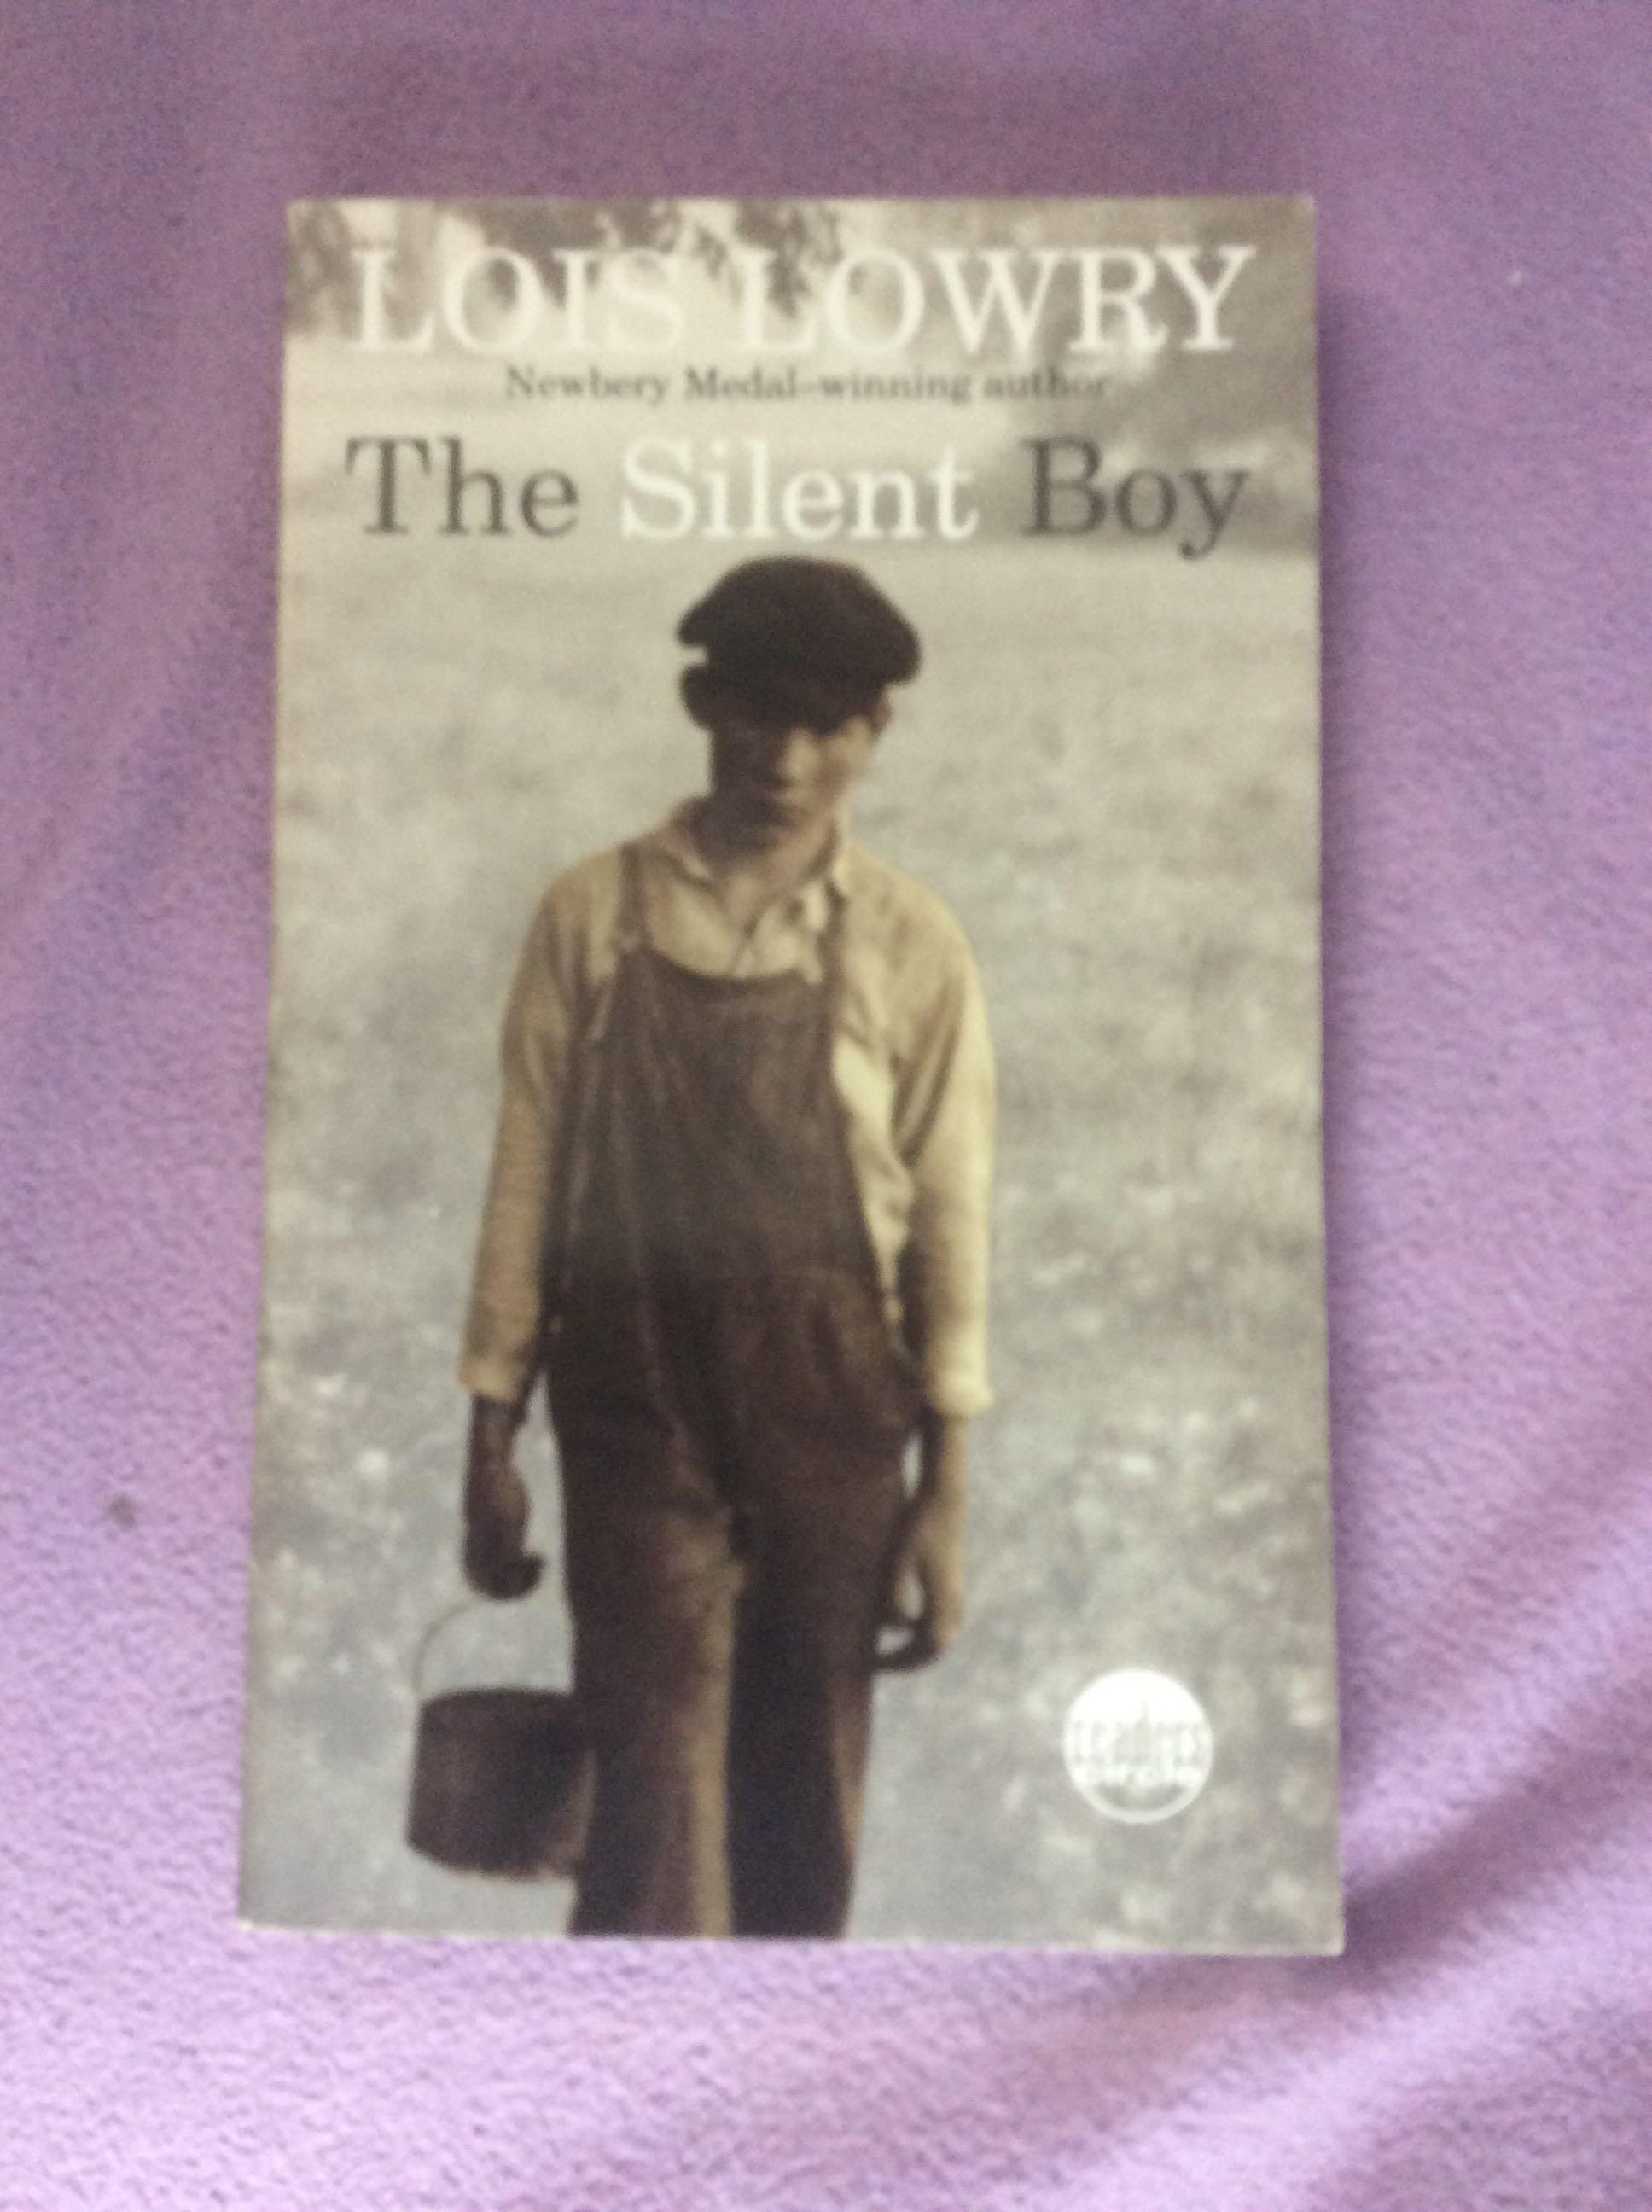 The Silent Boy book